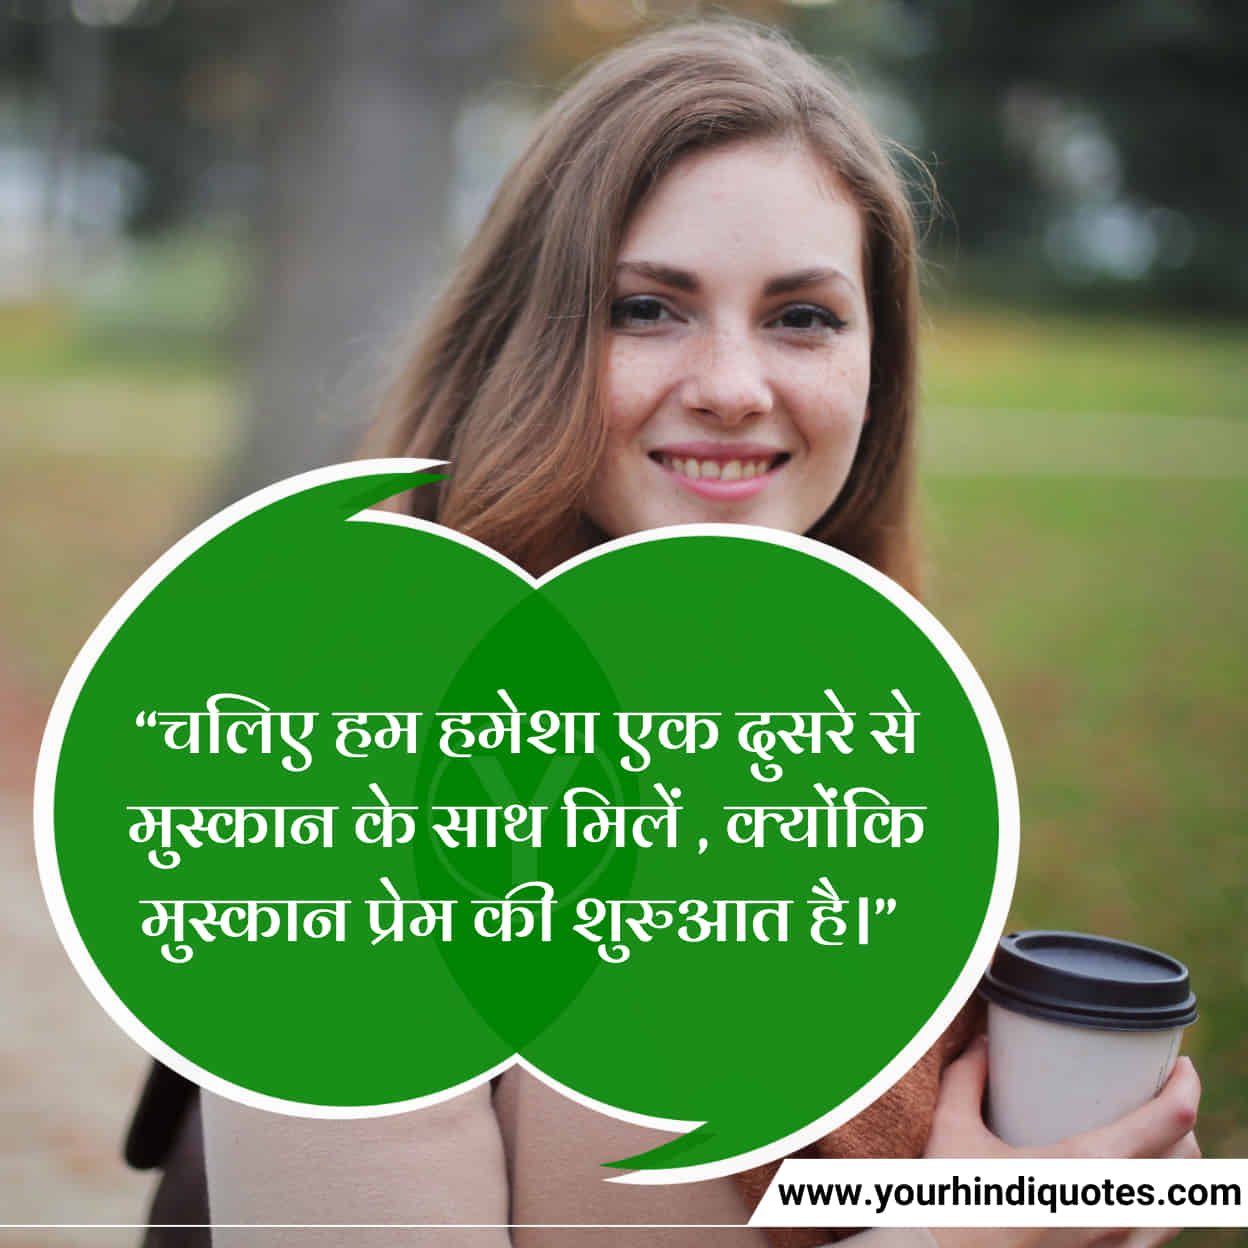 Latest Hindi Smile Quotes